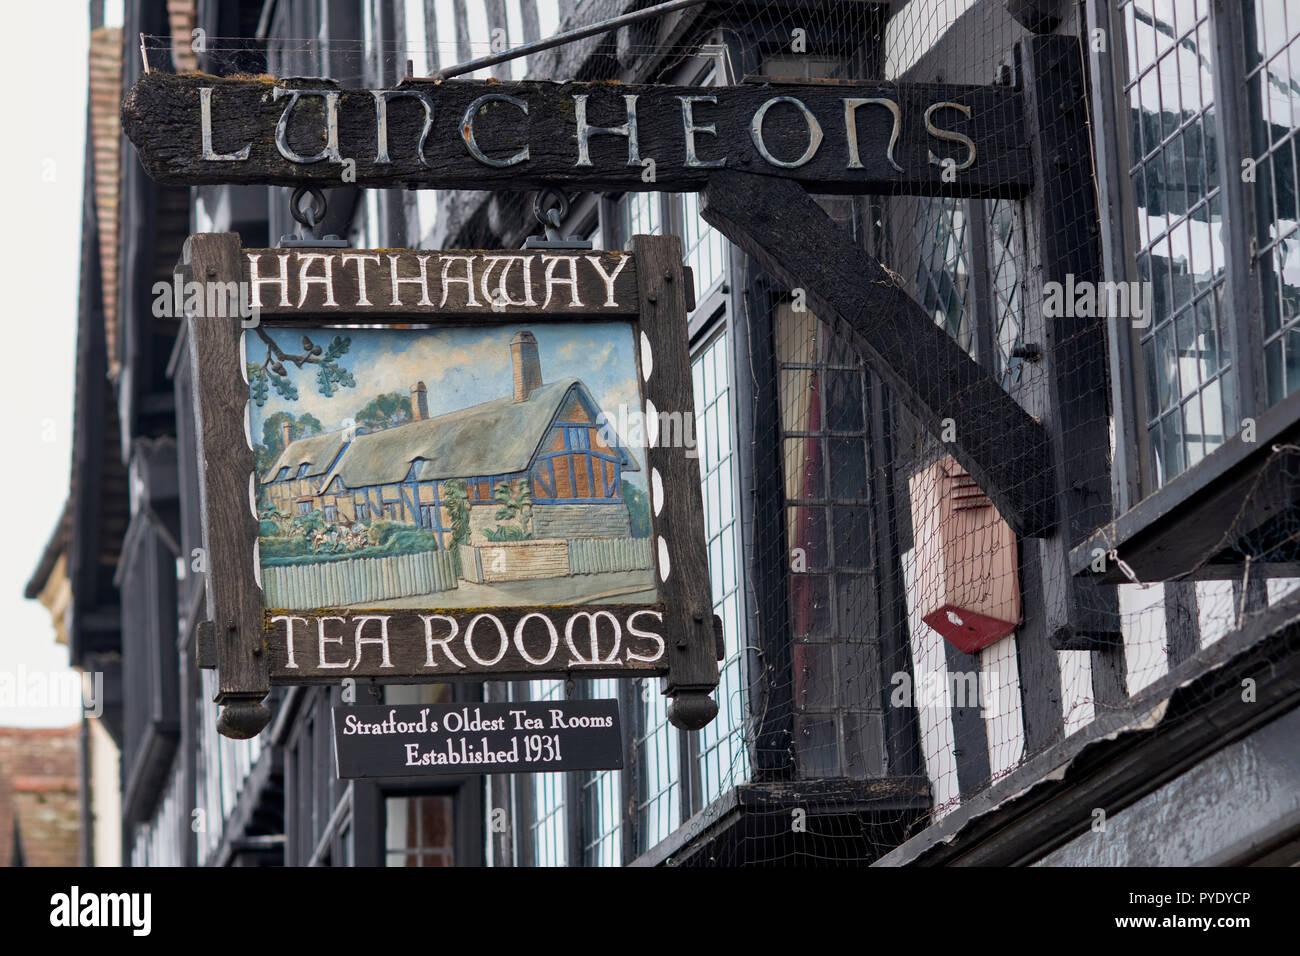 Hathaway tea rooms sign, High Street, Stratford upon Avon, Warwickshire, England Stock Photo